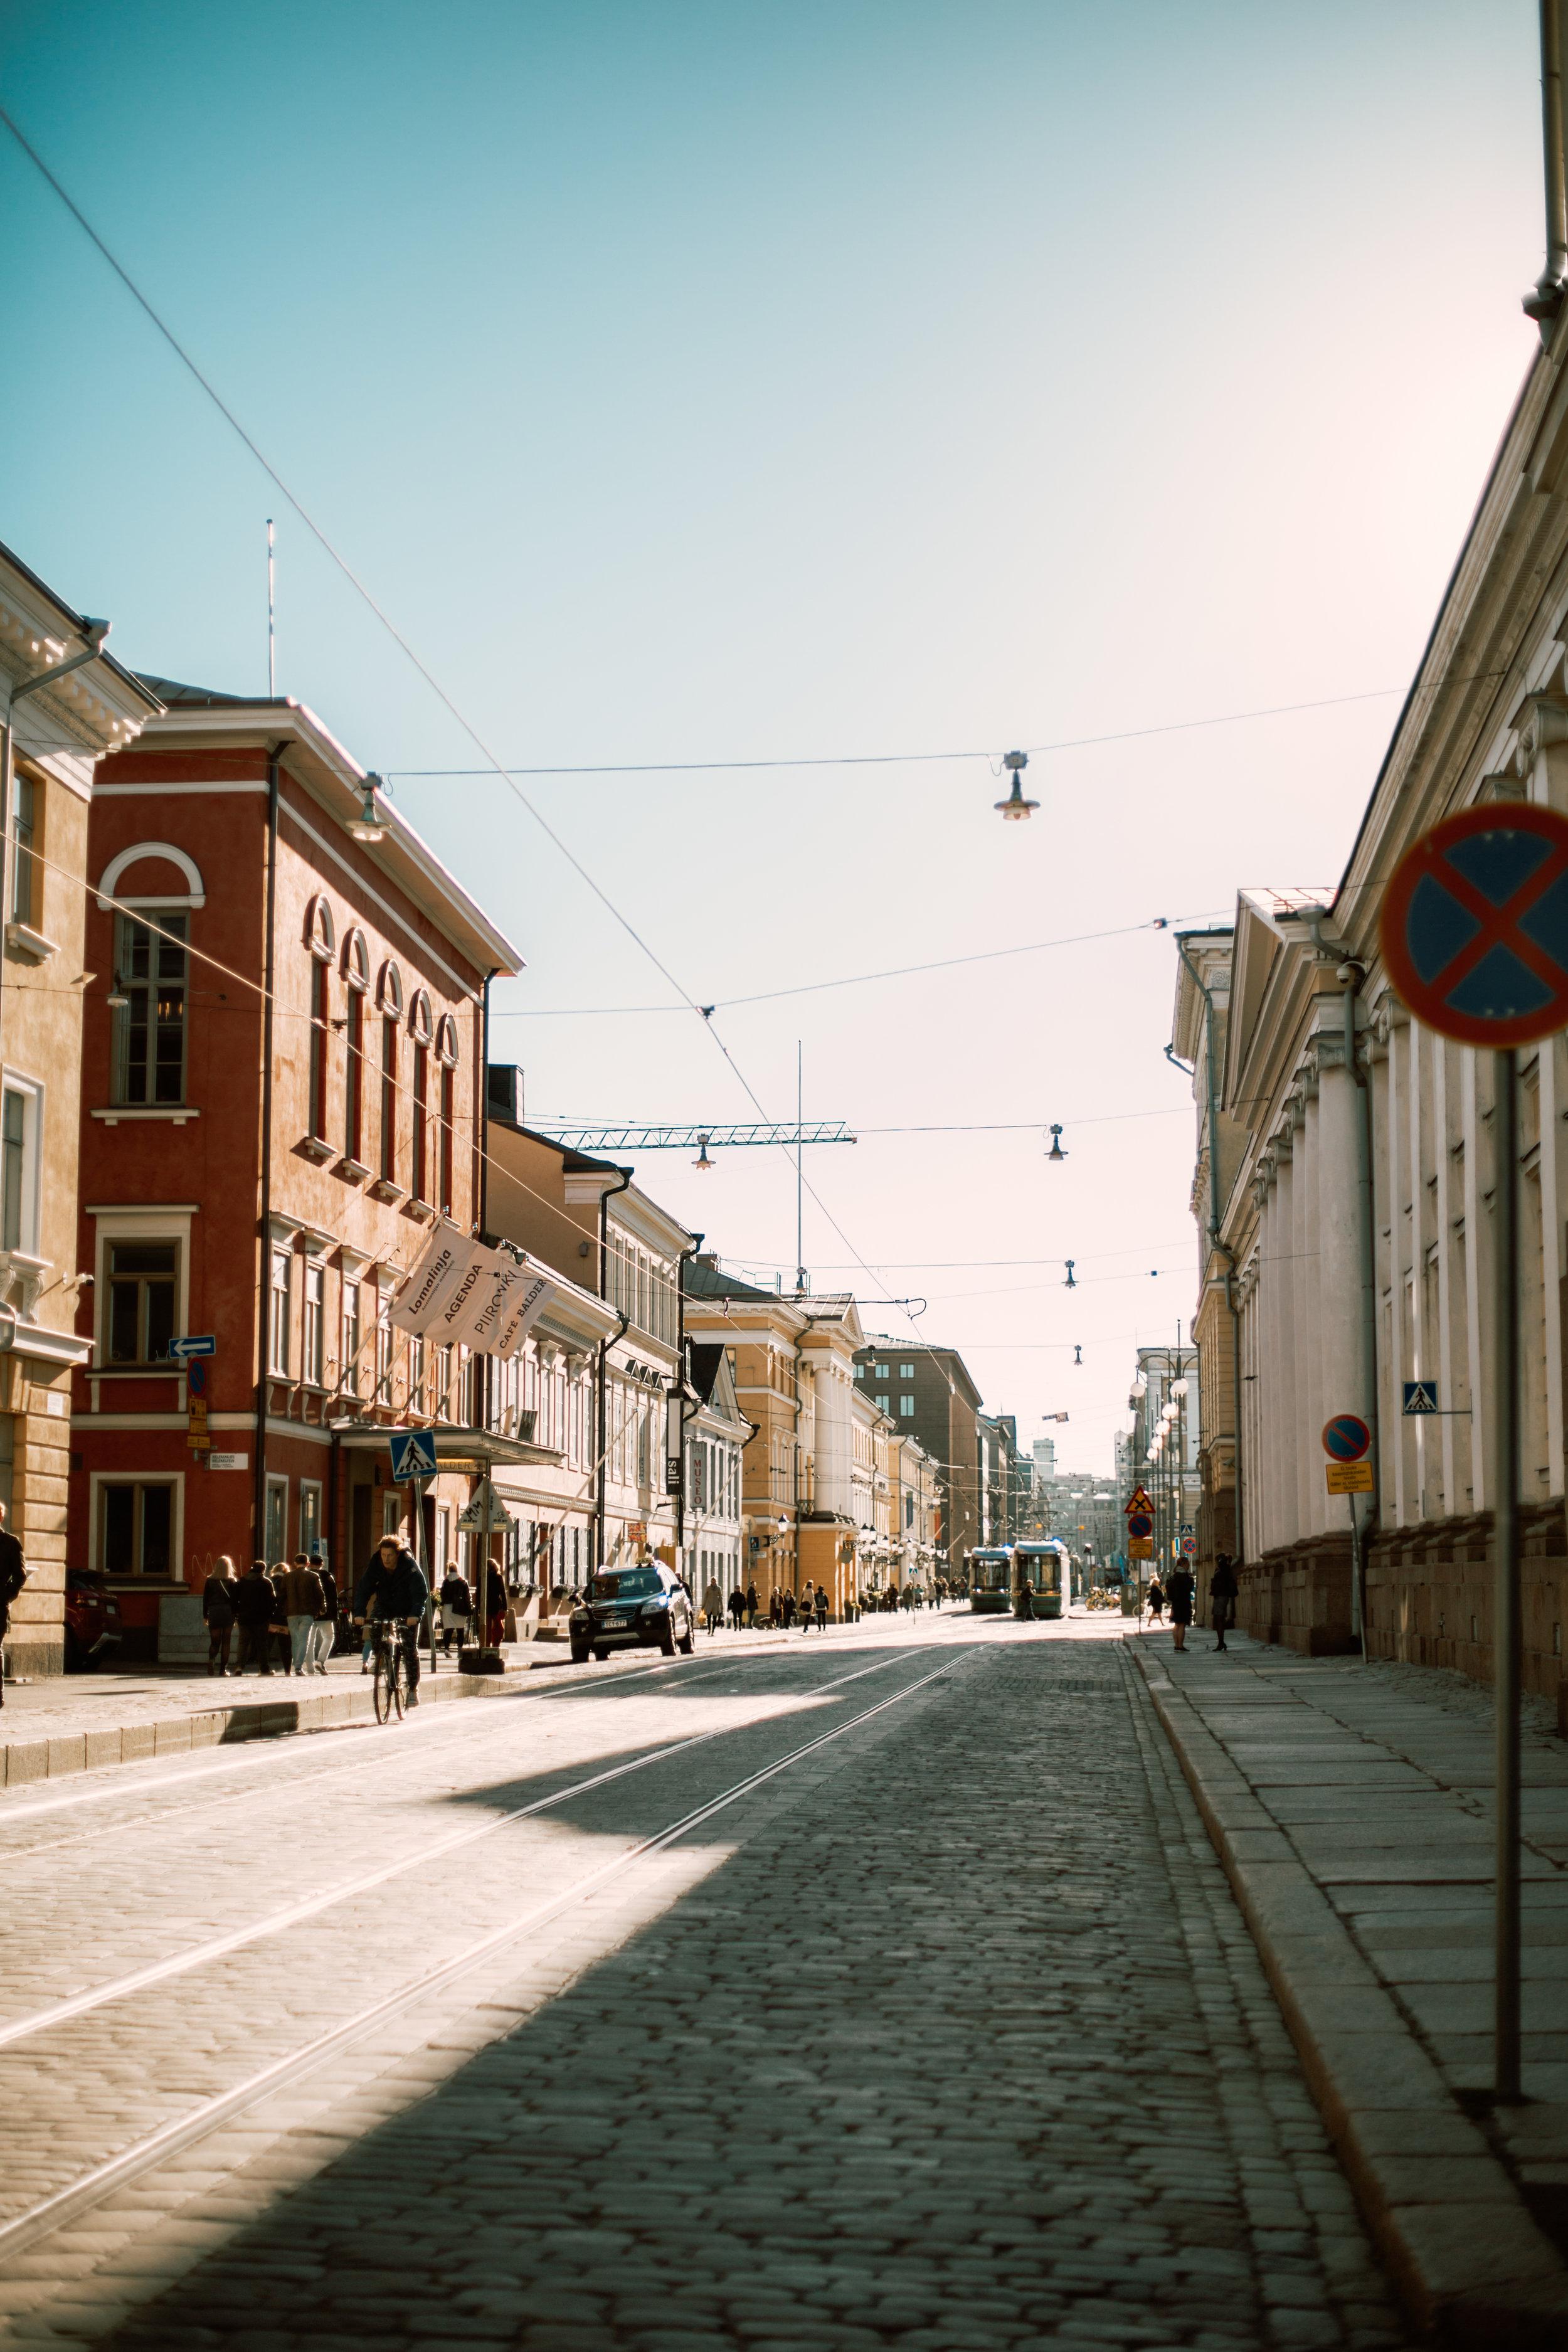 Finland_0519_0015.JPG